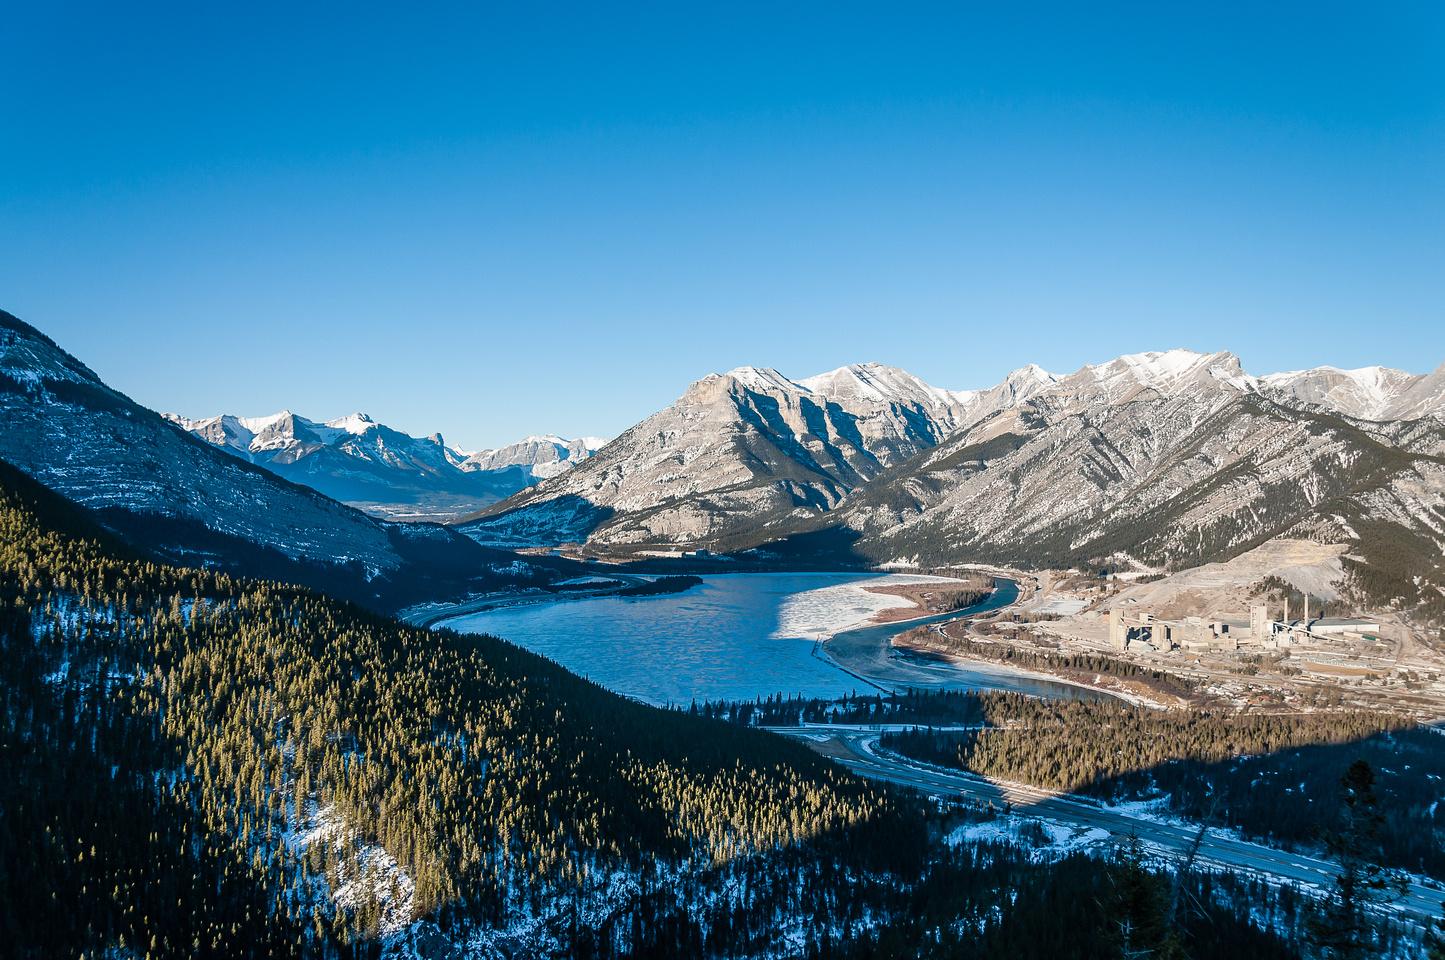 Views over Lac des Arcs towards Grotto and Gap Peak (R).